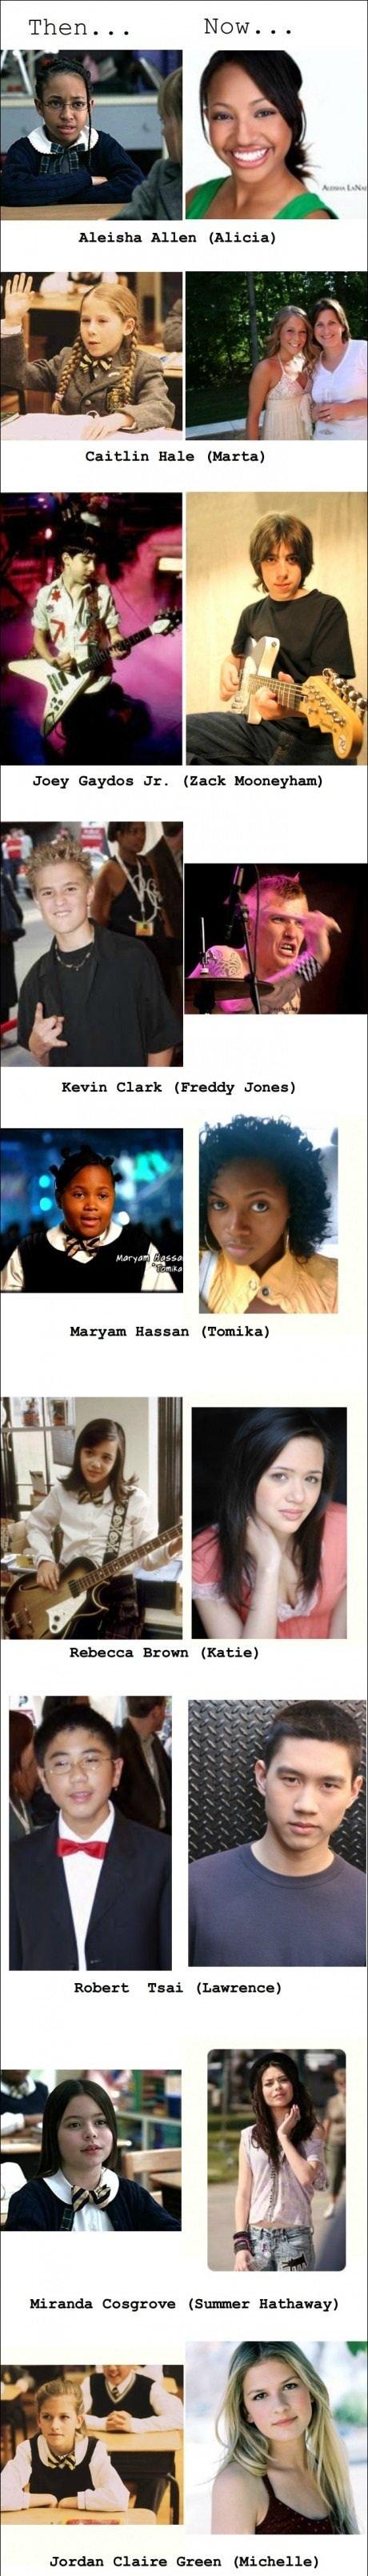 School of Rock cast then and now. . Caitlin Hale {Marta} Joey Gaydar Jr. {Zack ', Ila Hobart Taar {Lawrence} Jordan Claire Graan [iall, ! t, rt', then now